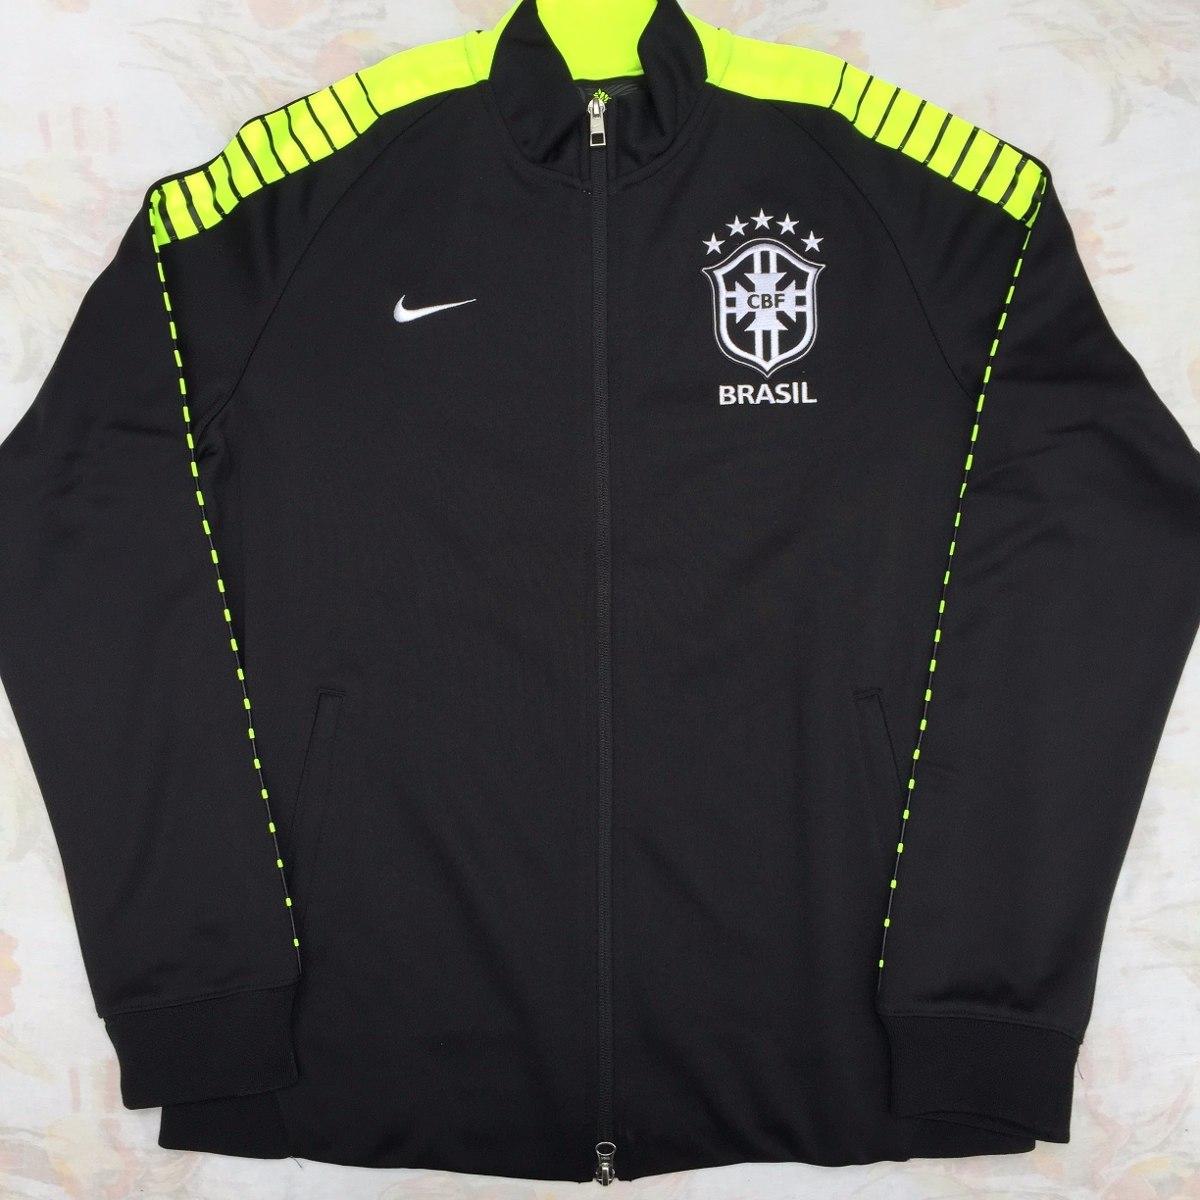 ed4de93a3b1e2 667019-010 Jaqueta Nike N98 Cbf Brasil G Preta Fn1608 - R  1.199